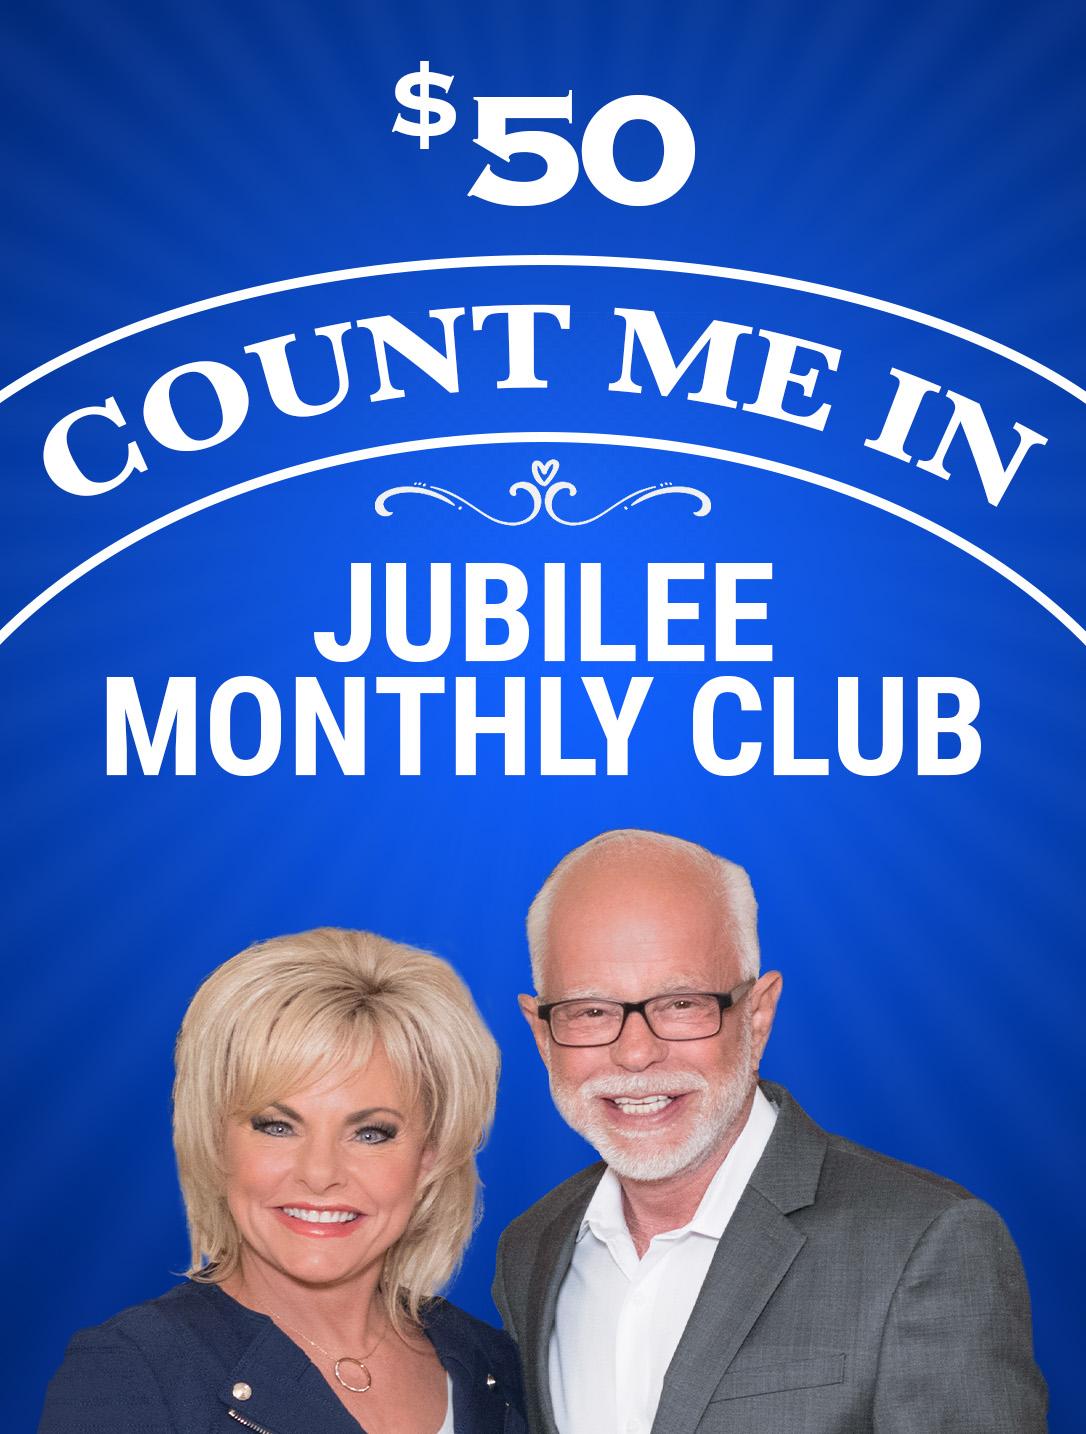 Count Me In - Jubilee Club - $50